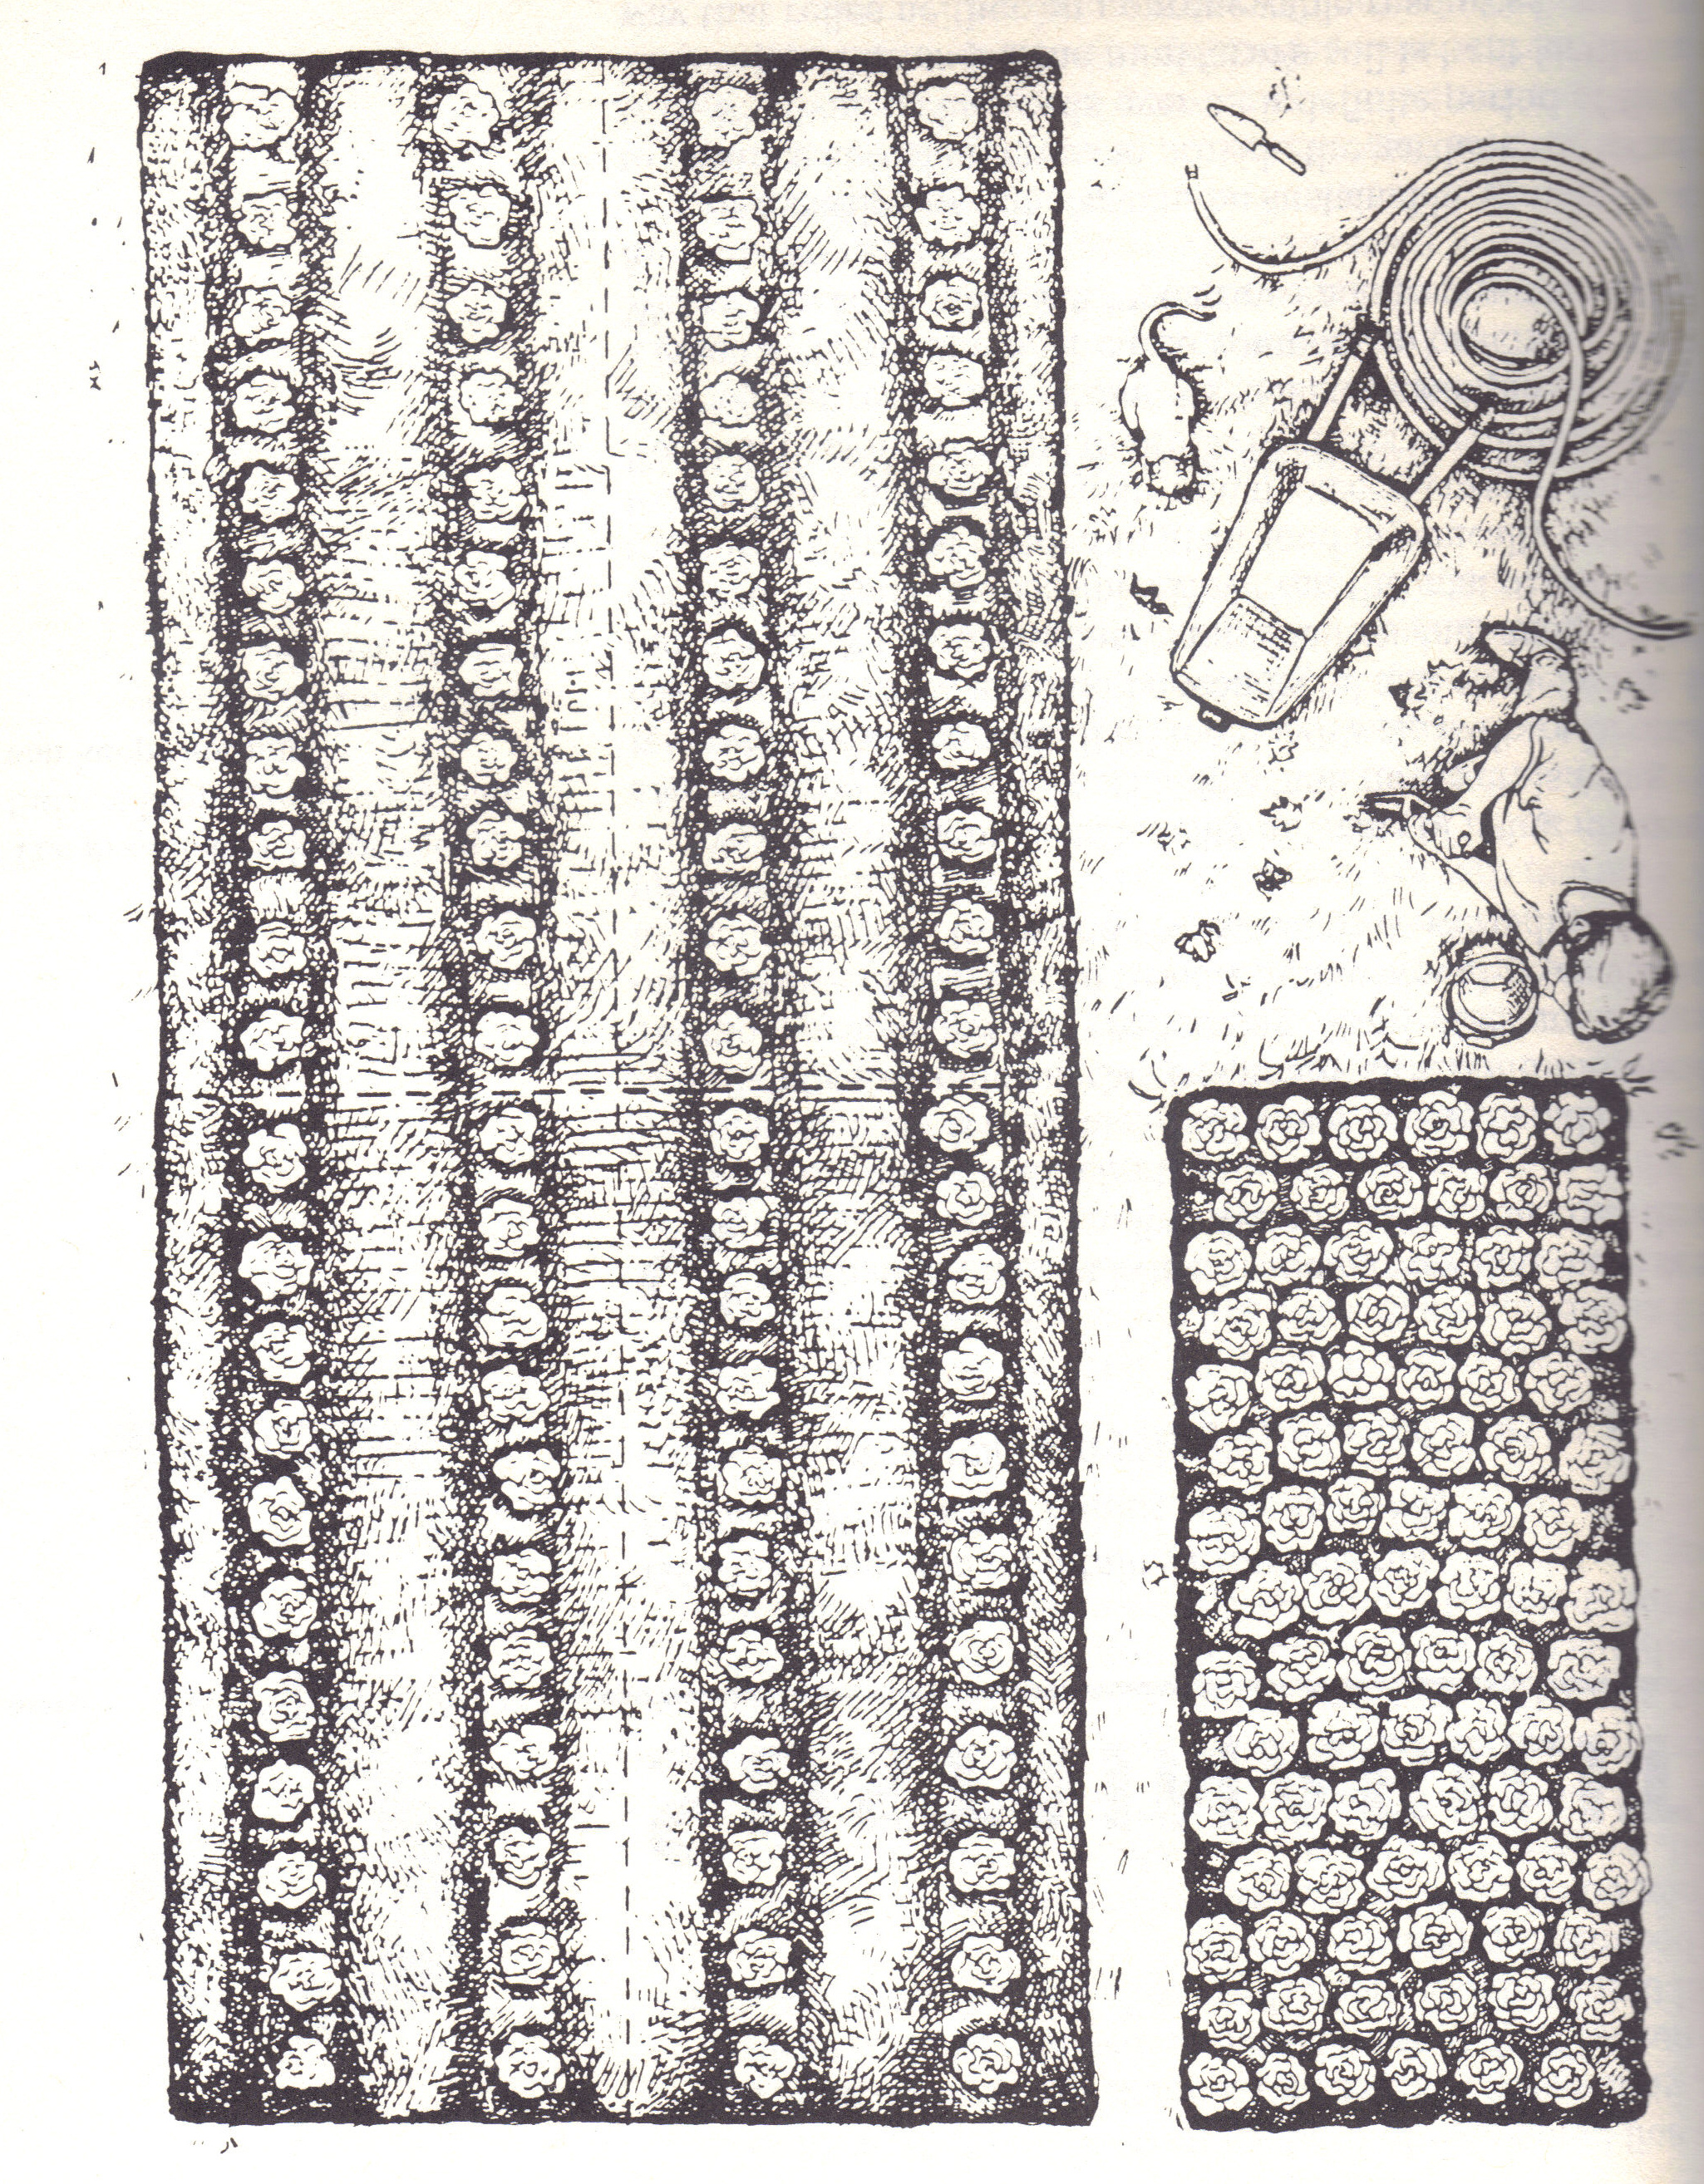 Biointensive Planting